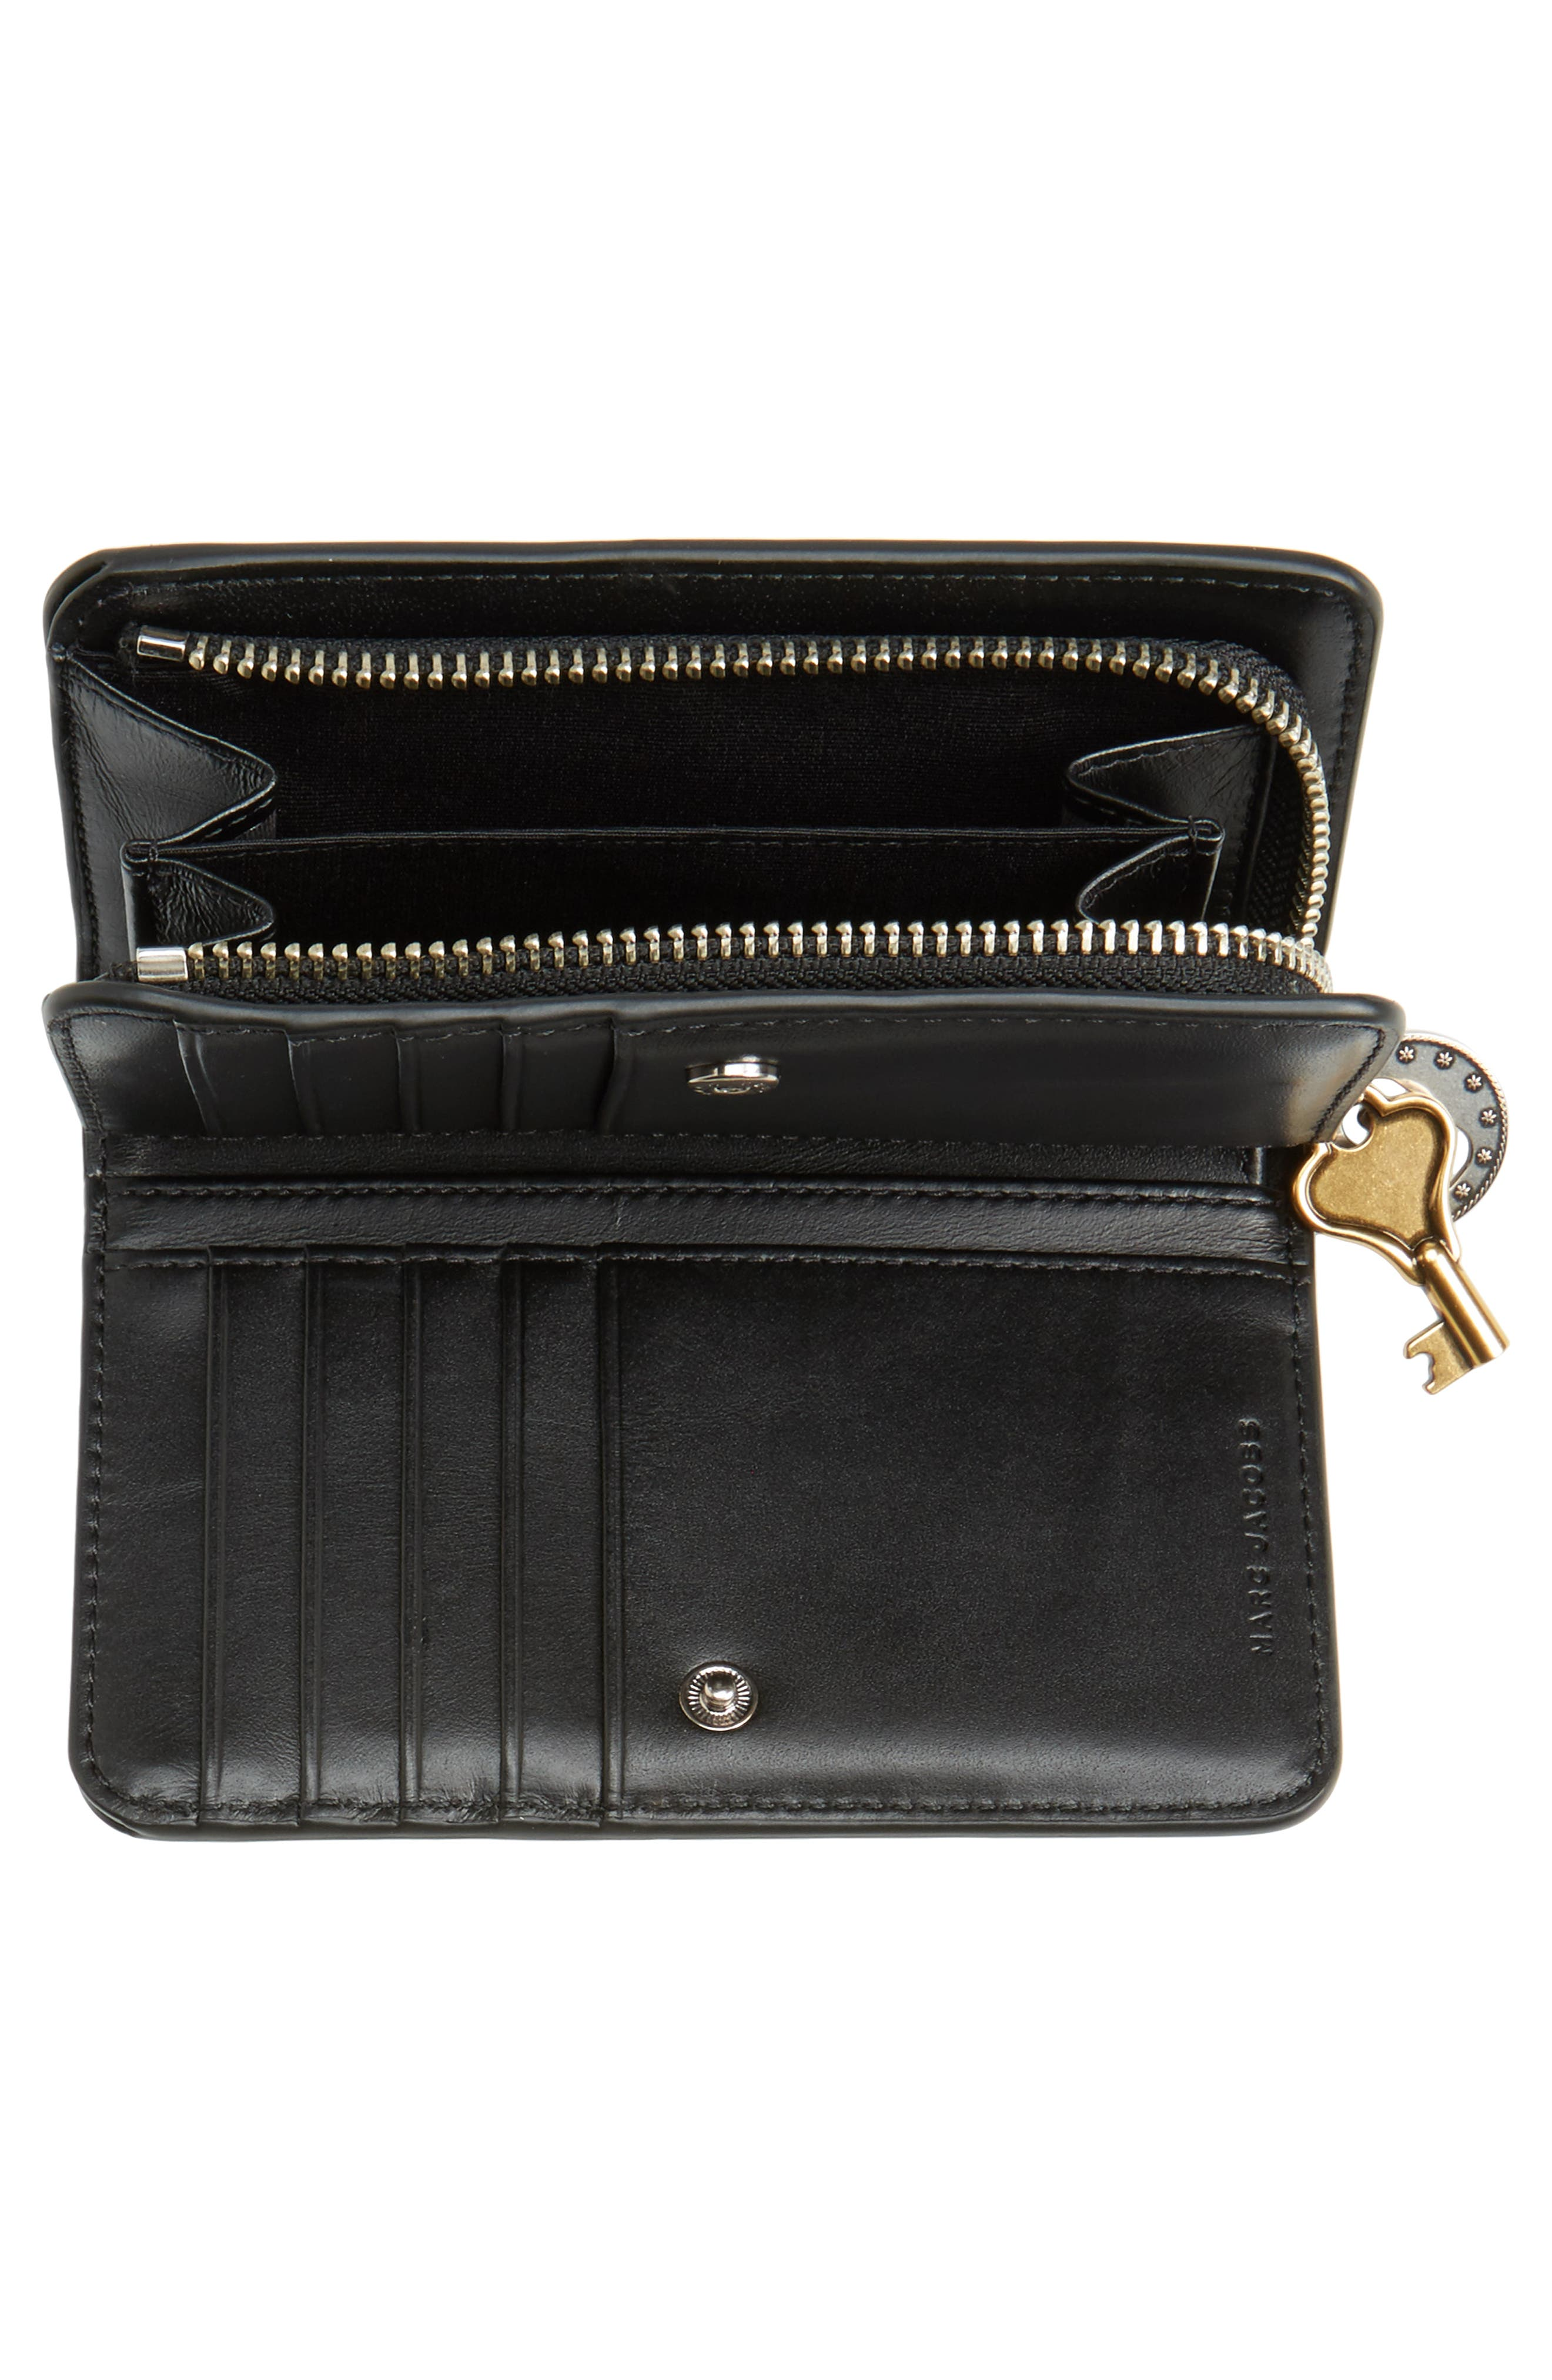 MARC JACOBS,                             Saffiano Leather Compact Wallet,                             Alternate thumbnail 4, color,                             410